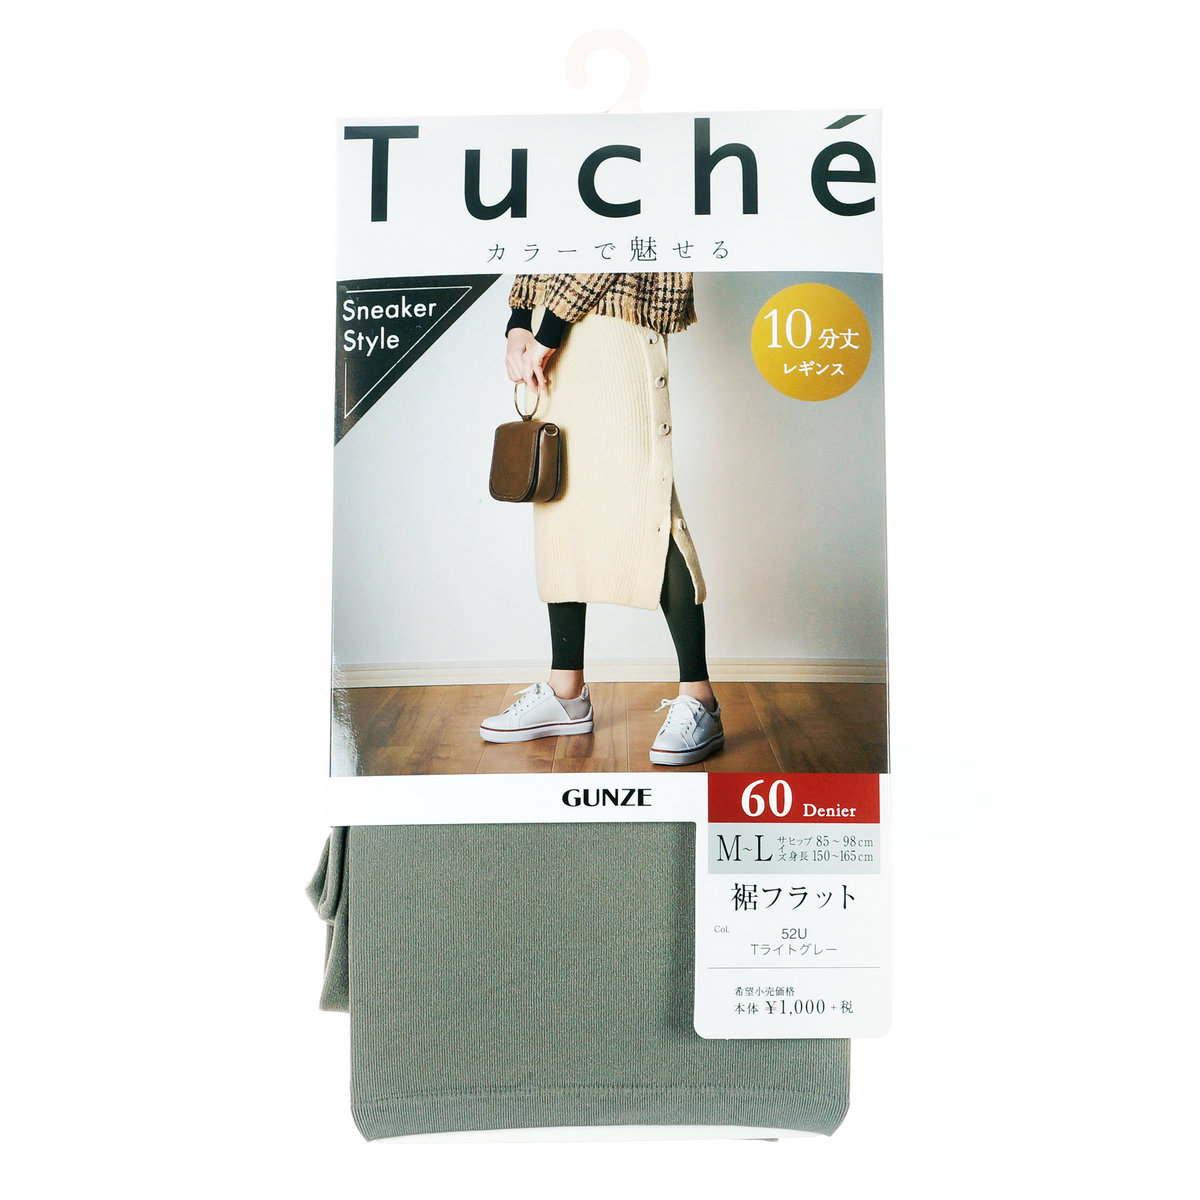 TUCHE THF21E Sneaker Style Ankle Leggings, Color: 52U Light Grey, Size: M-L (4967162865198)